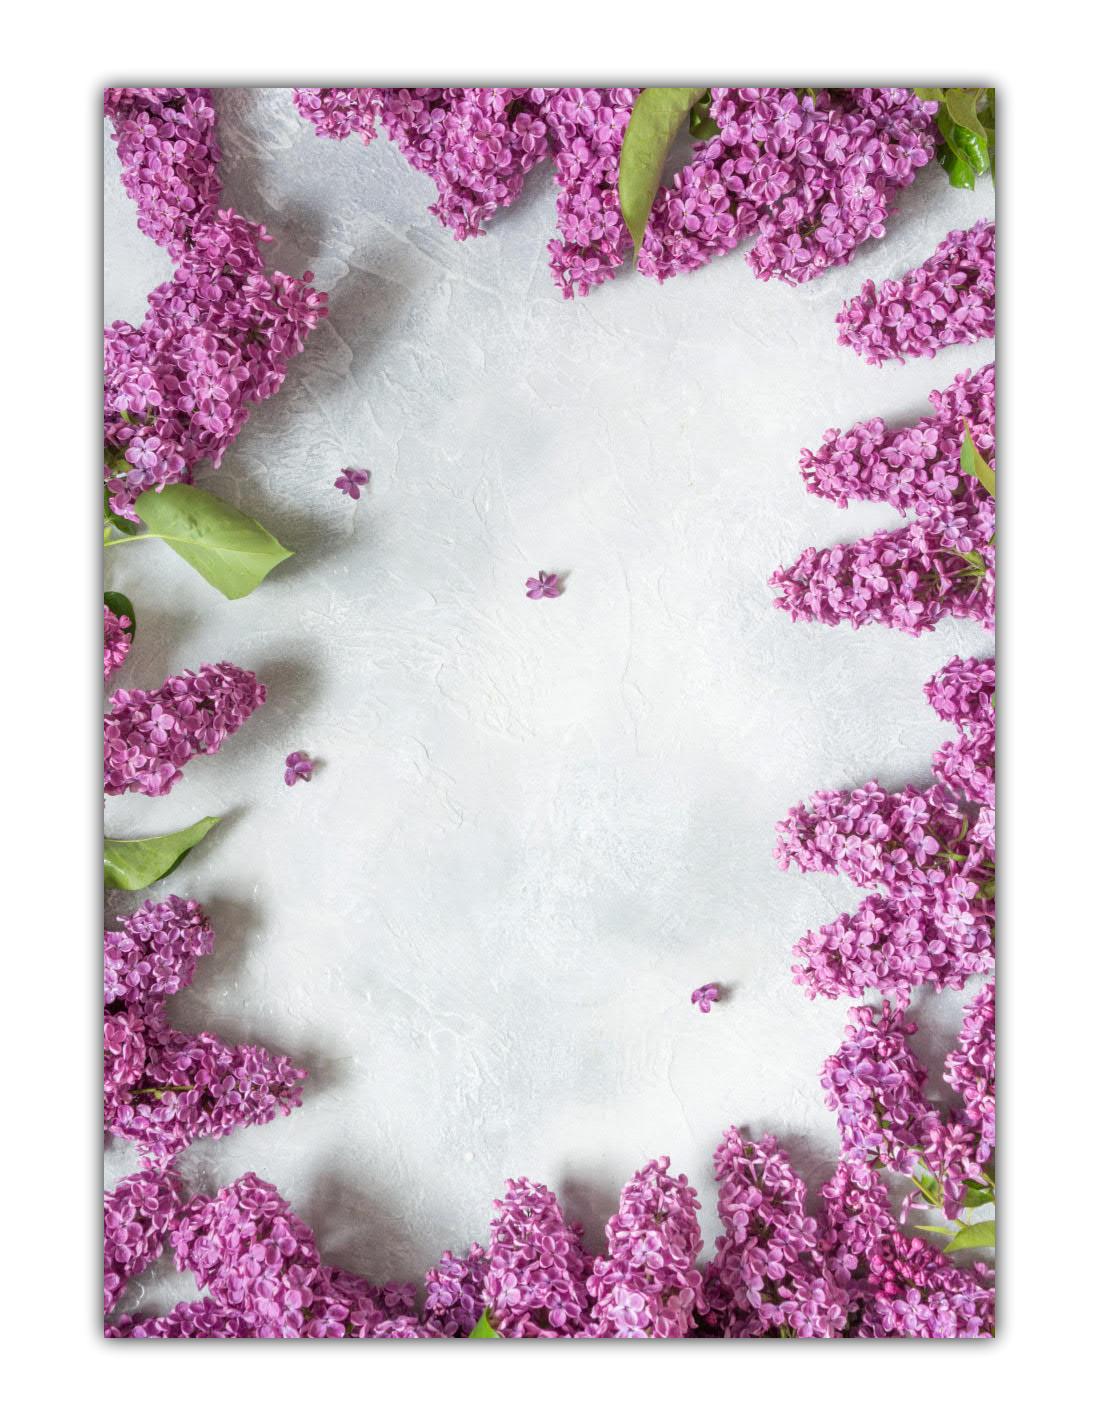 Motivpapier Briefpapier Blumen Blüten Flieder violett (MPA-5214, DIN A4, 100 Blatt)